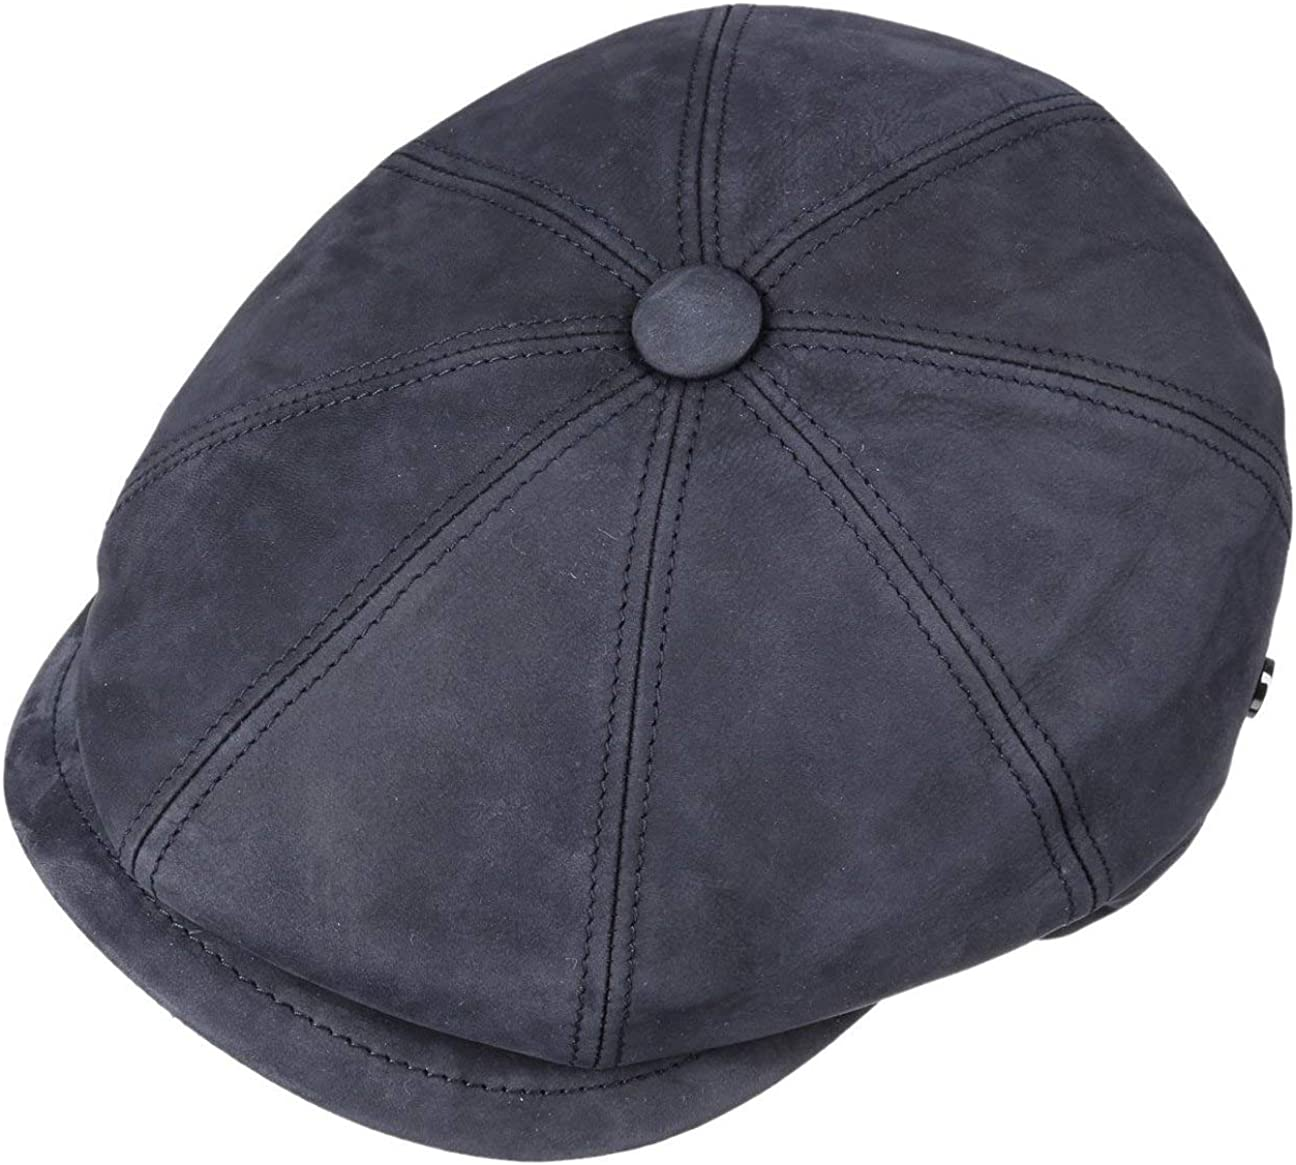 Lierys Nappa Wax Coppola in Pelle by Uomo Made Italy Flat cap Cappello Piatto Invernale con Visiera Fodera Autunno//Inverno